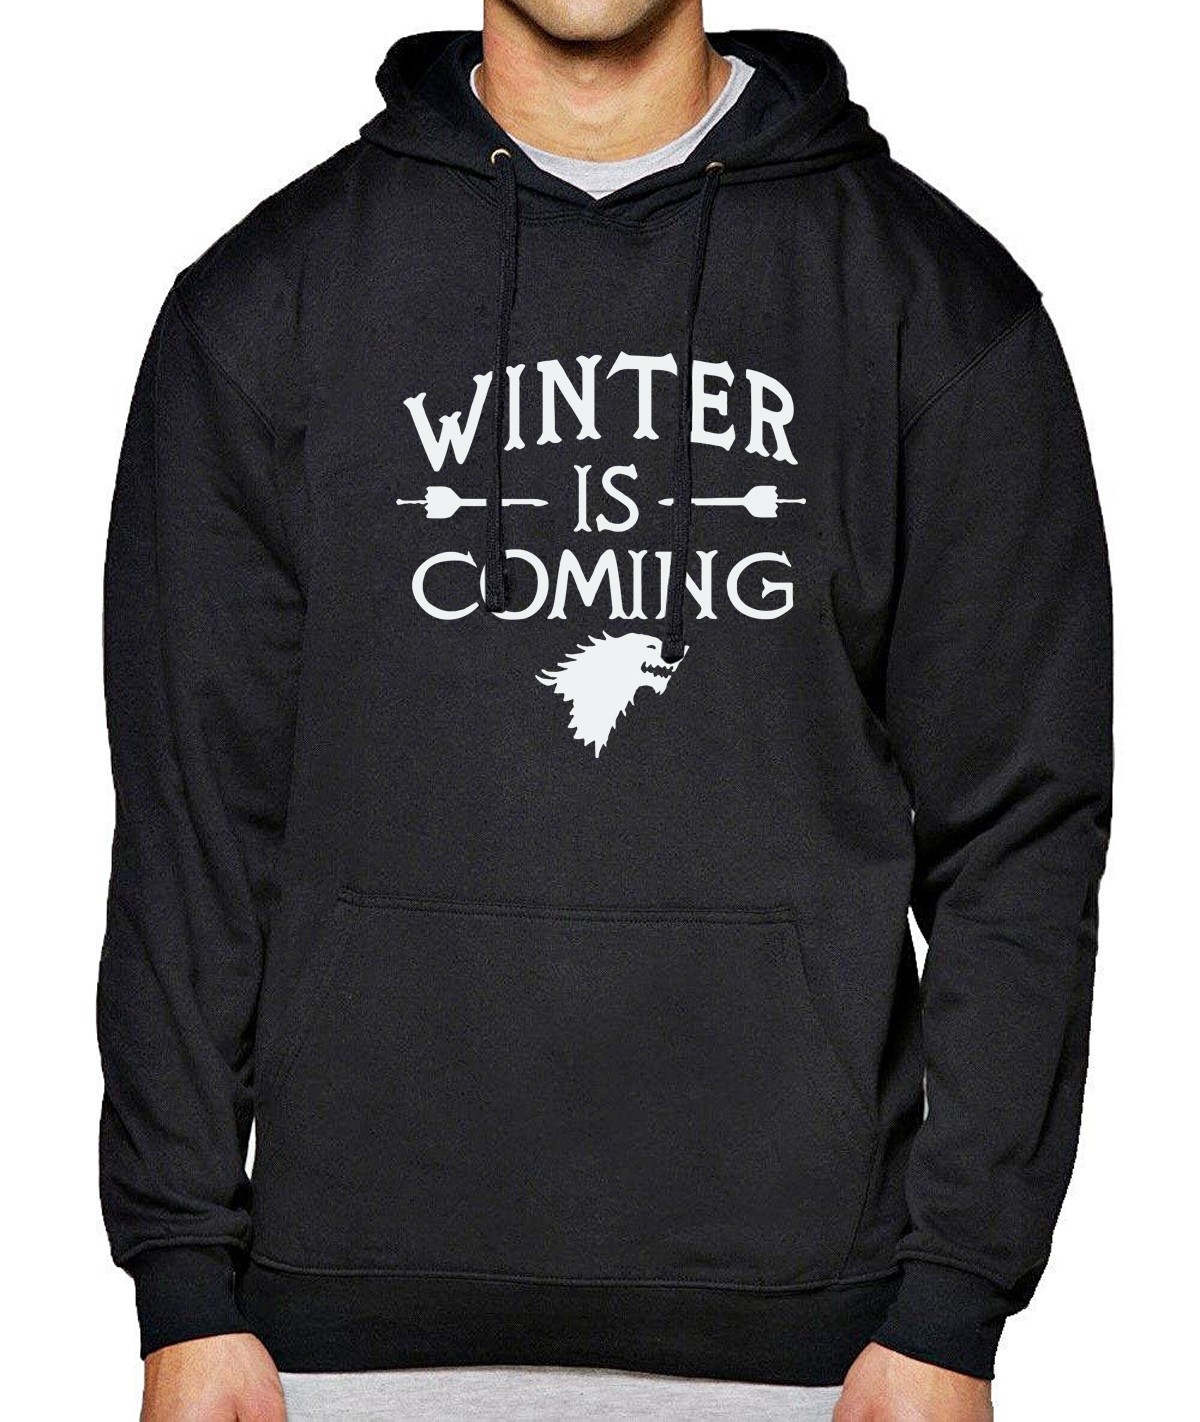 2018 Spring Winter Hoodies Men Sweatshirts Letter Game Of Thrones Print Fleece Hoody Fashion Men's Clothes Men's Sportswear